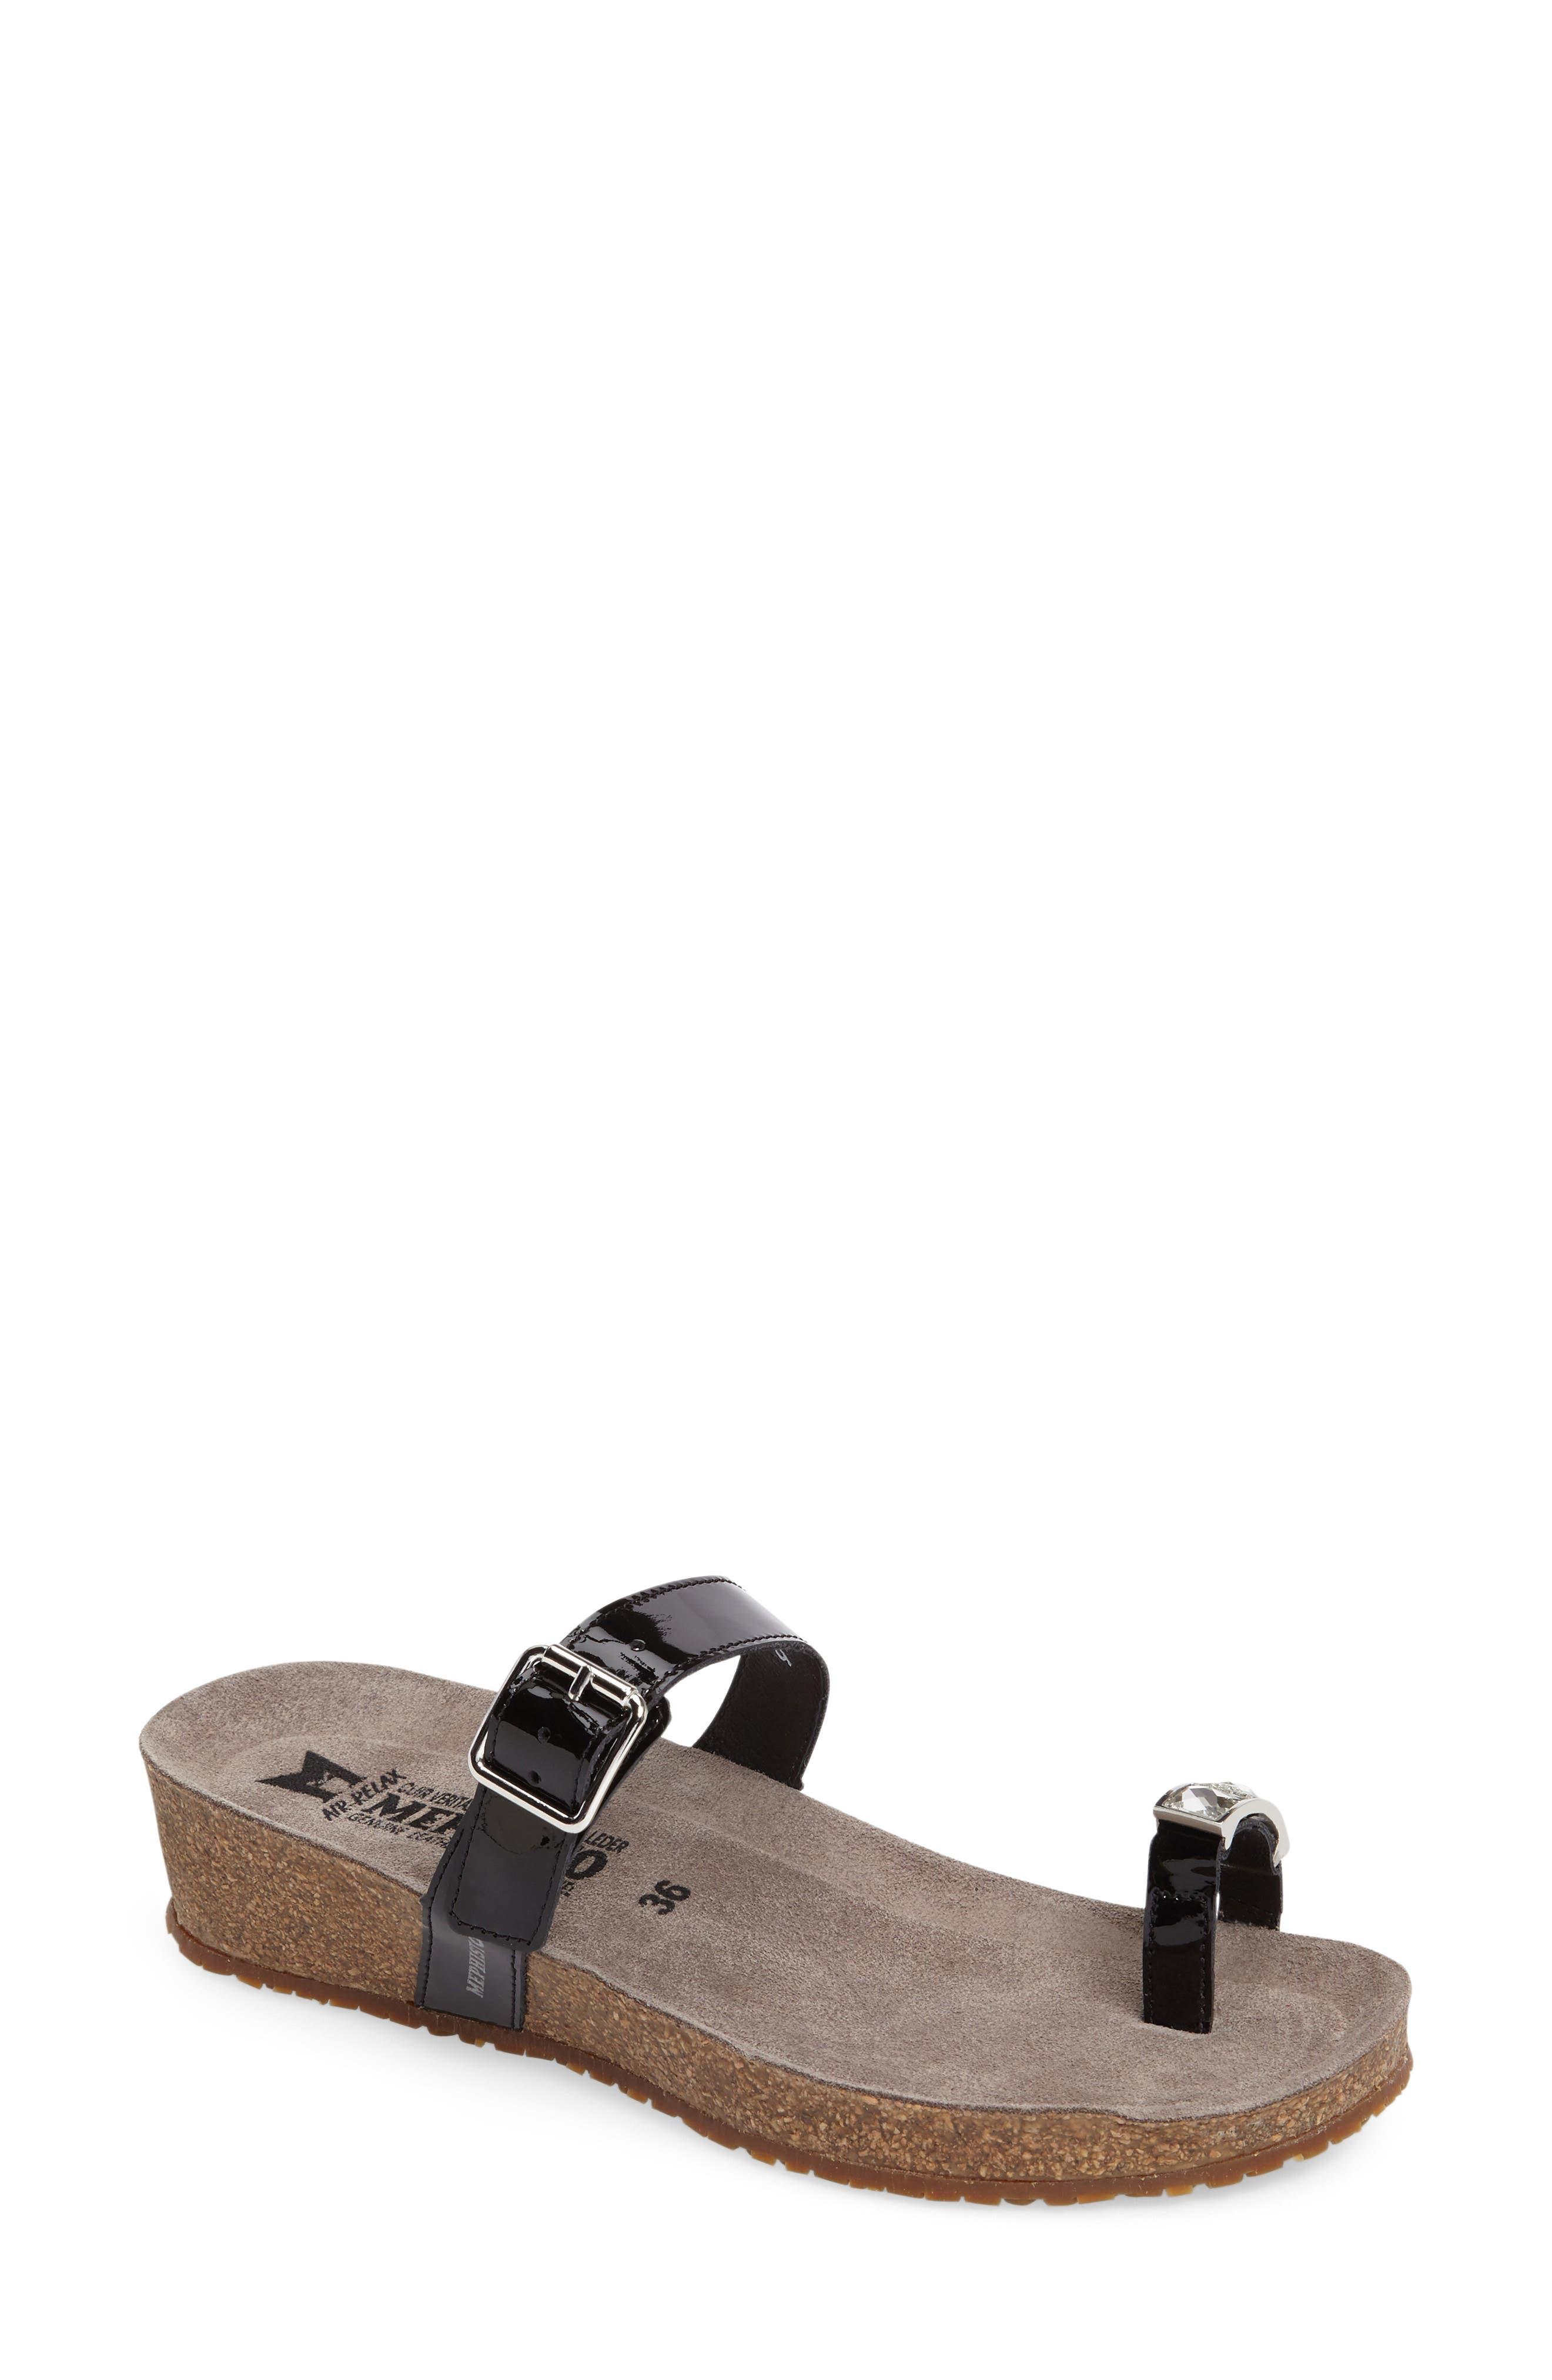 Ilaria Embellished Wedge Sandal,                             Main thumbnail 1, color,                             Black Patent Leather